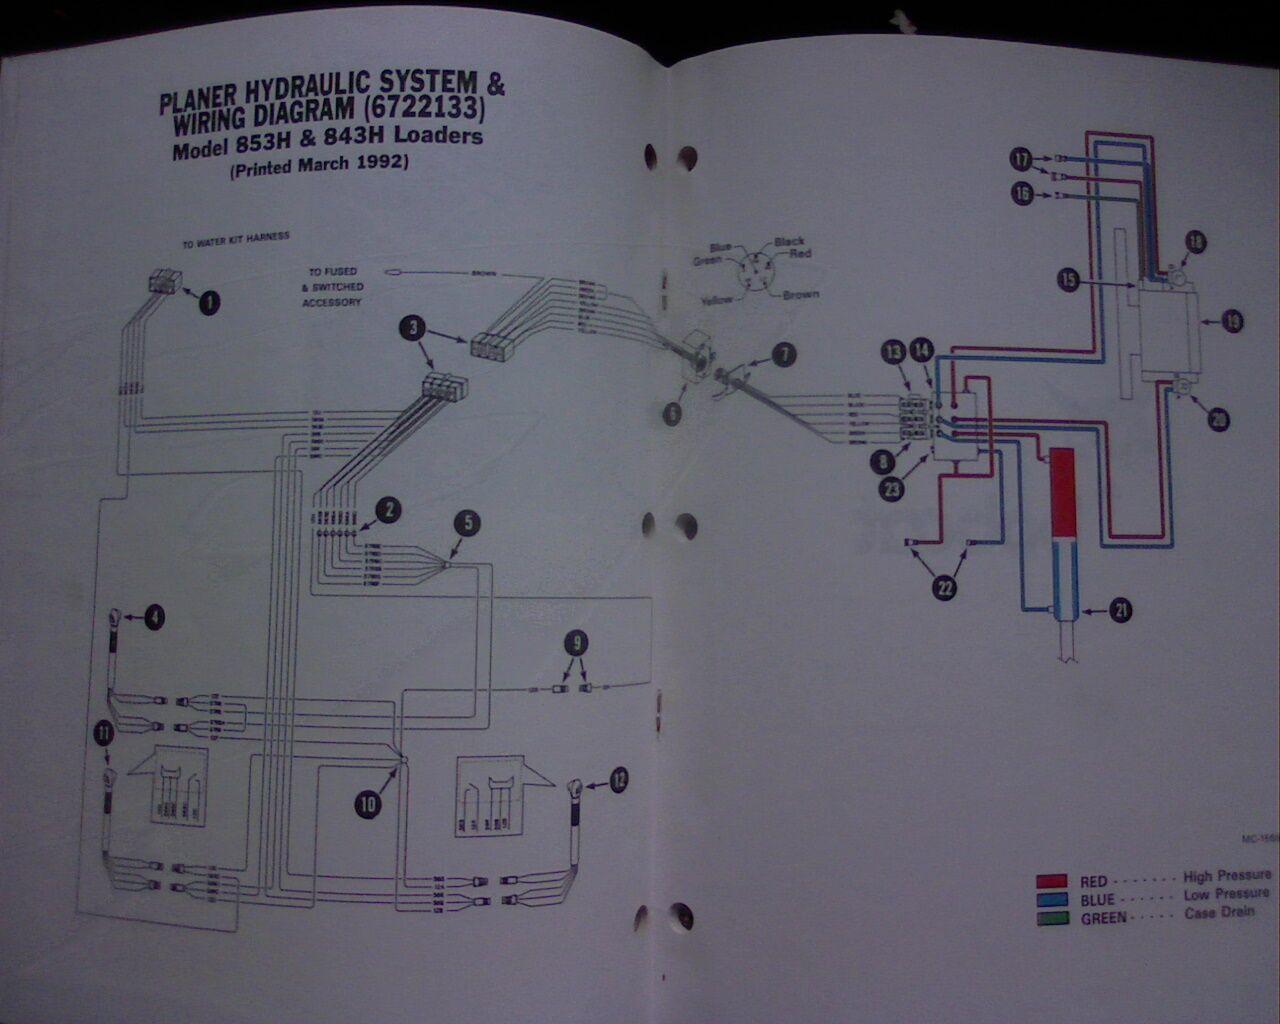 Bobcat Wire Harness Magnetek 6345 Wiring-diagram